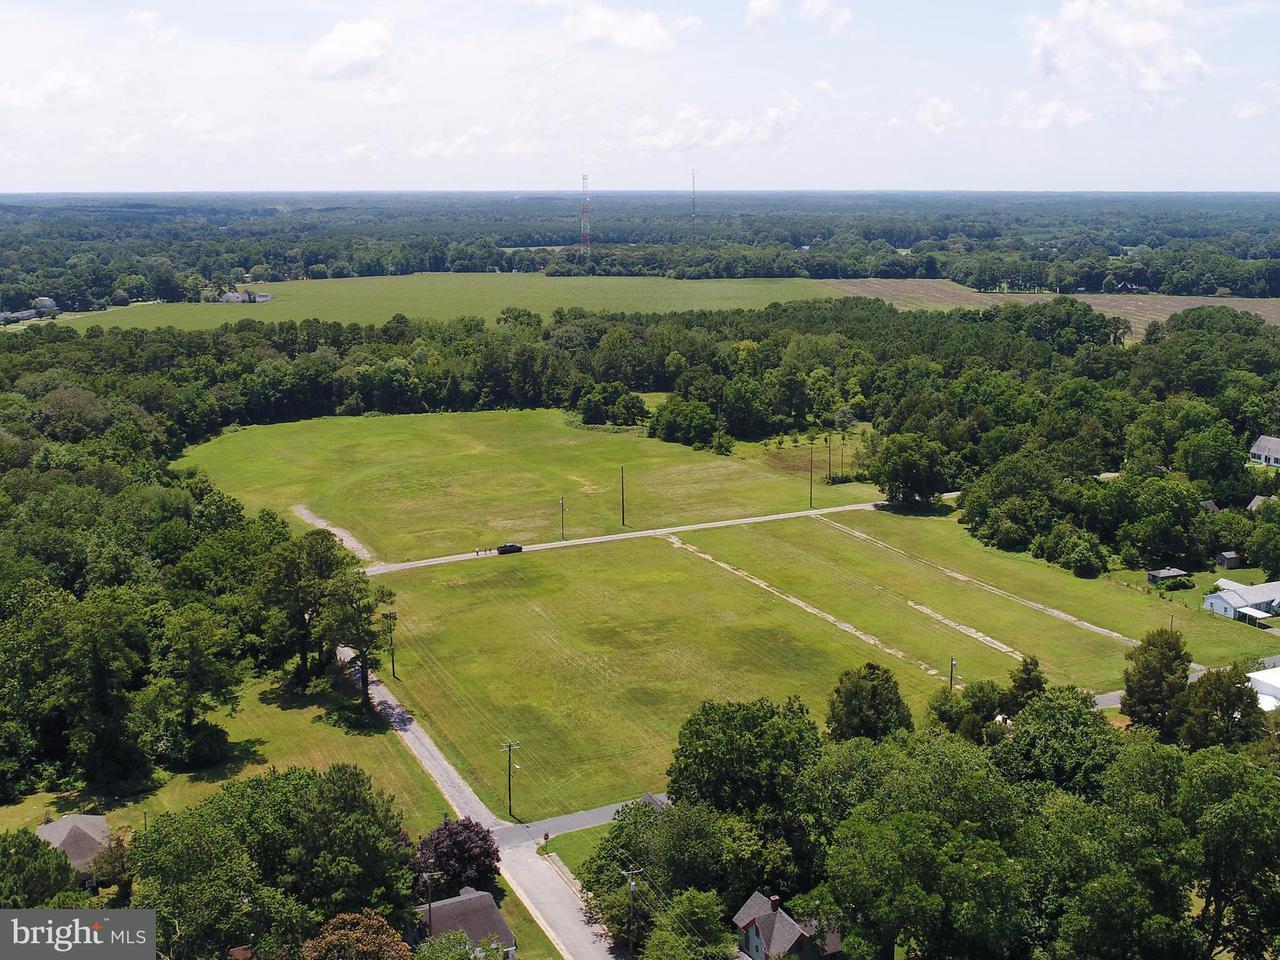 Land for Sale at Johnson Rd Onancock, Virginia 23417 United States